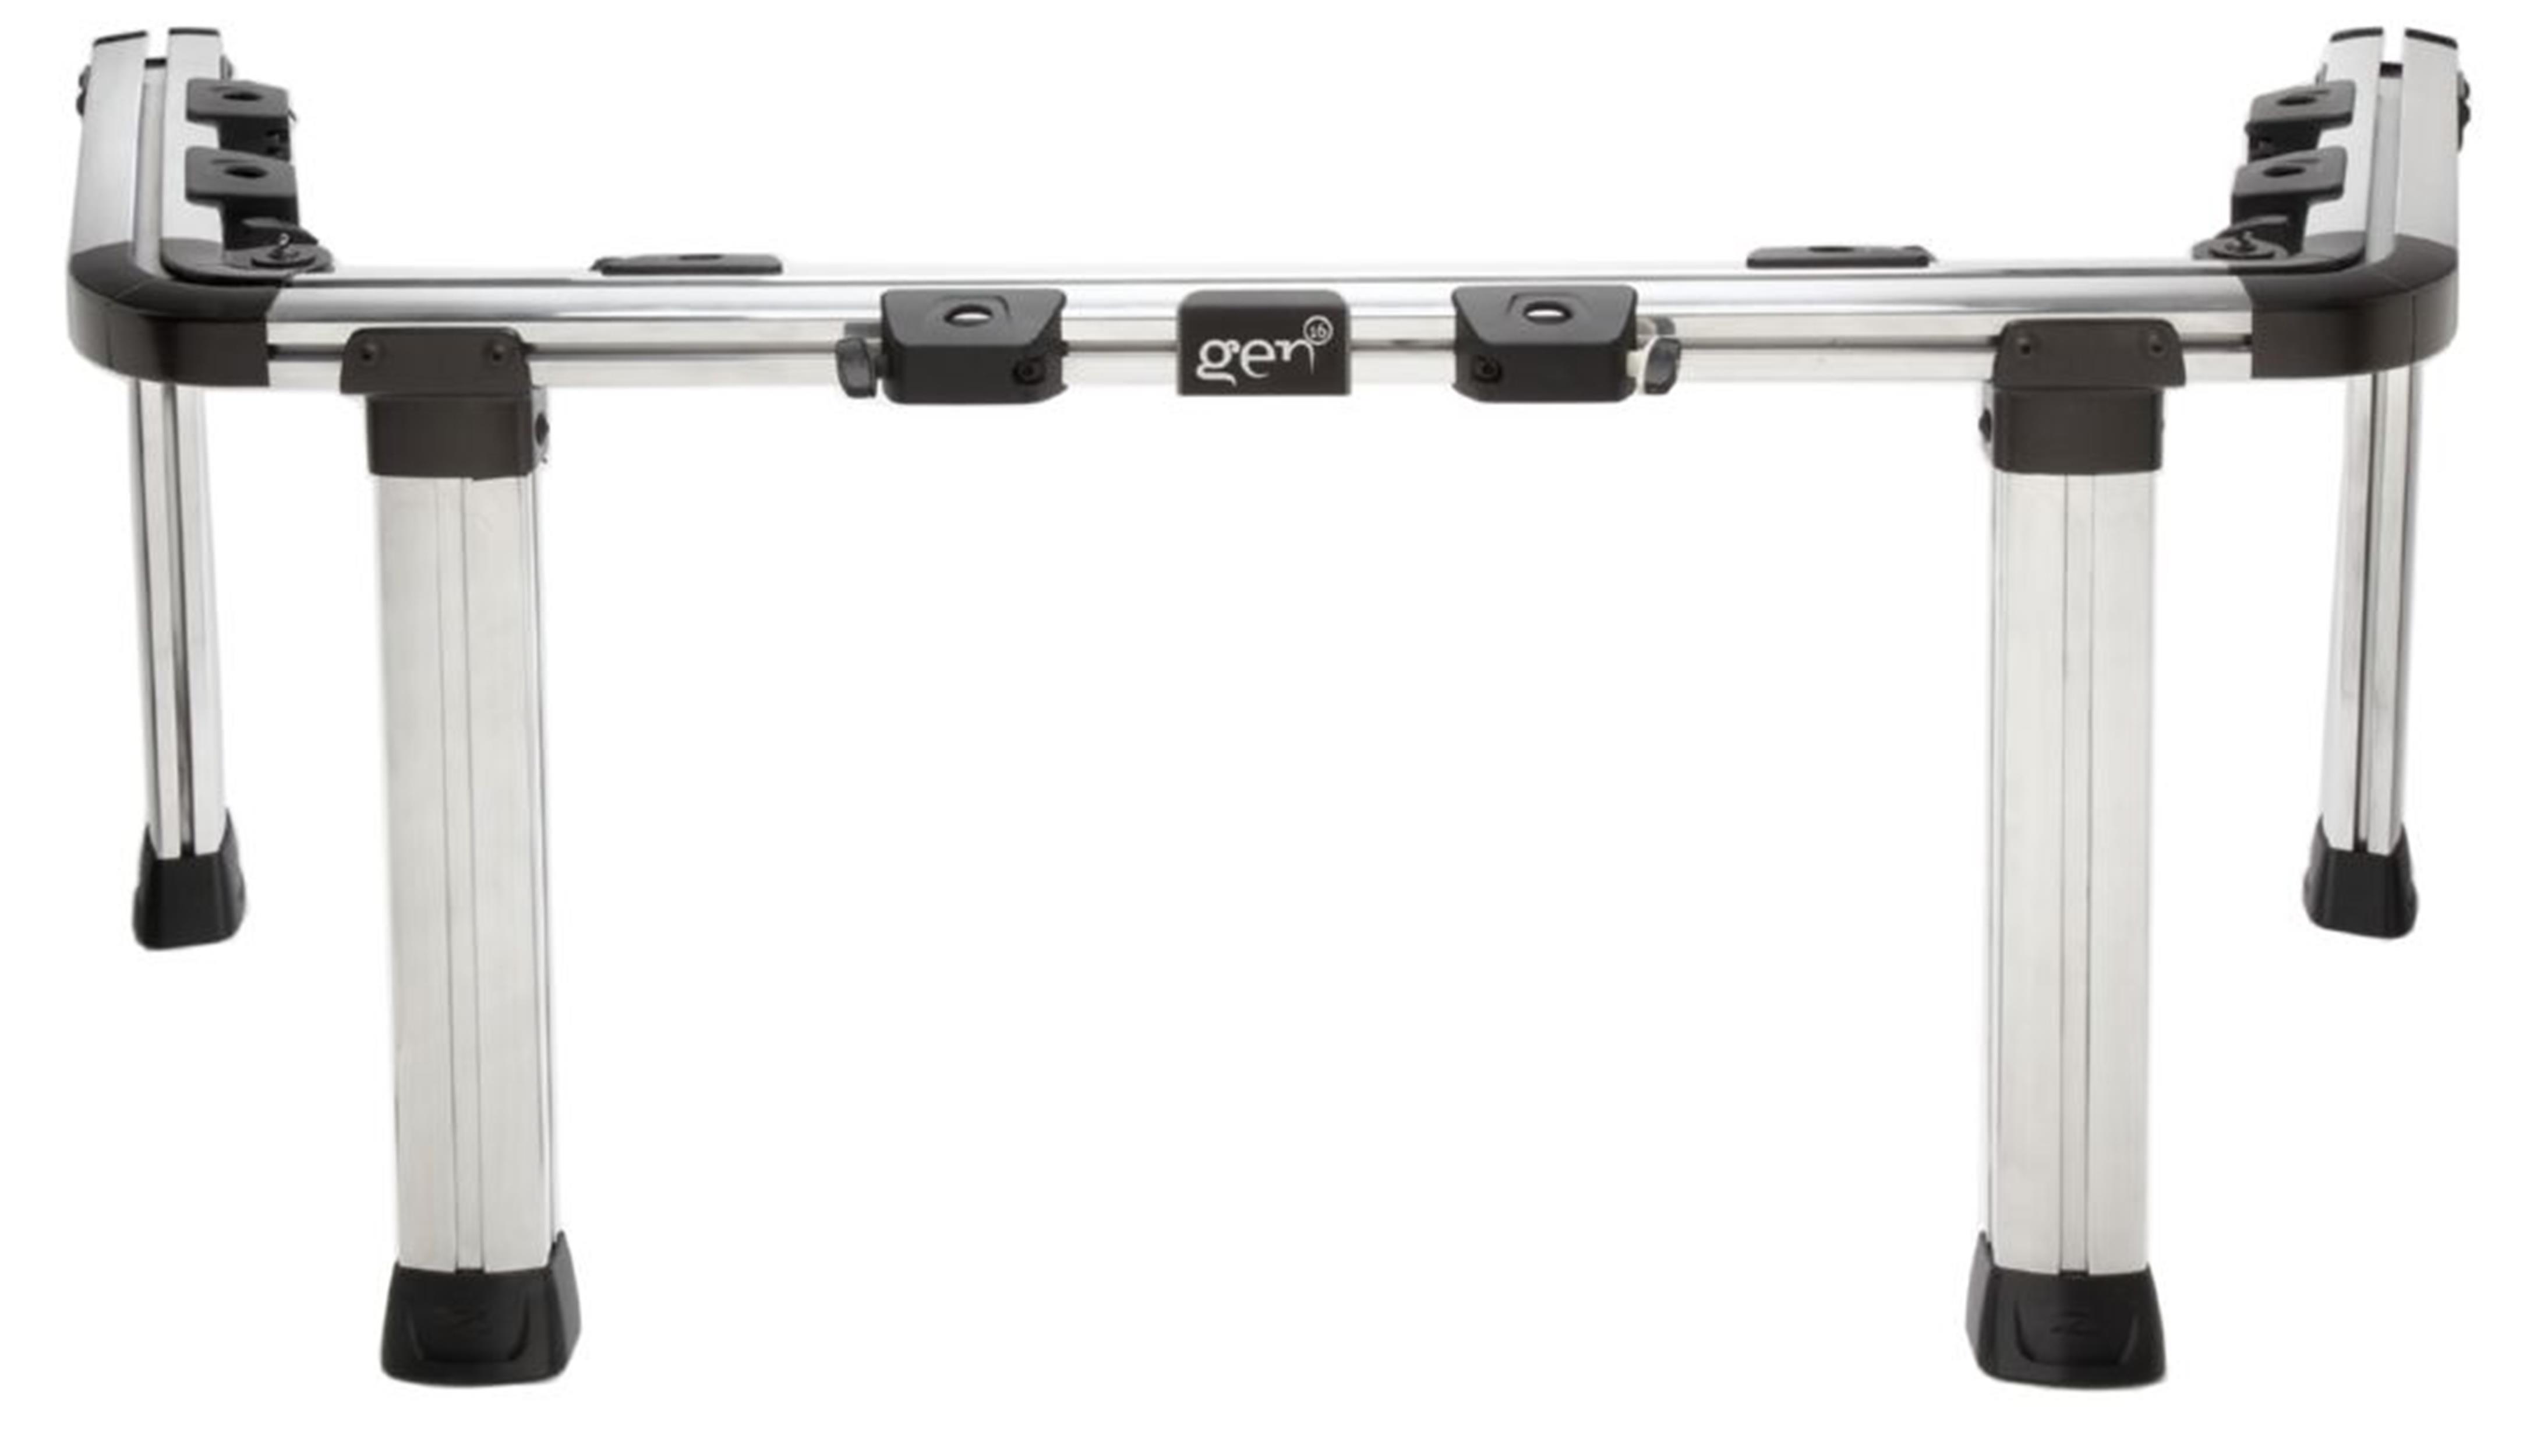 Zildjian AE Drum Rack in alluminio - altezza 20 (cm. 51)